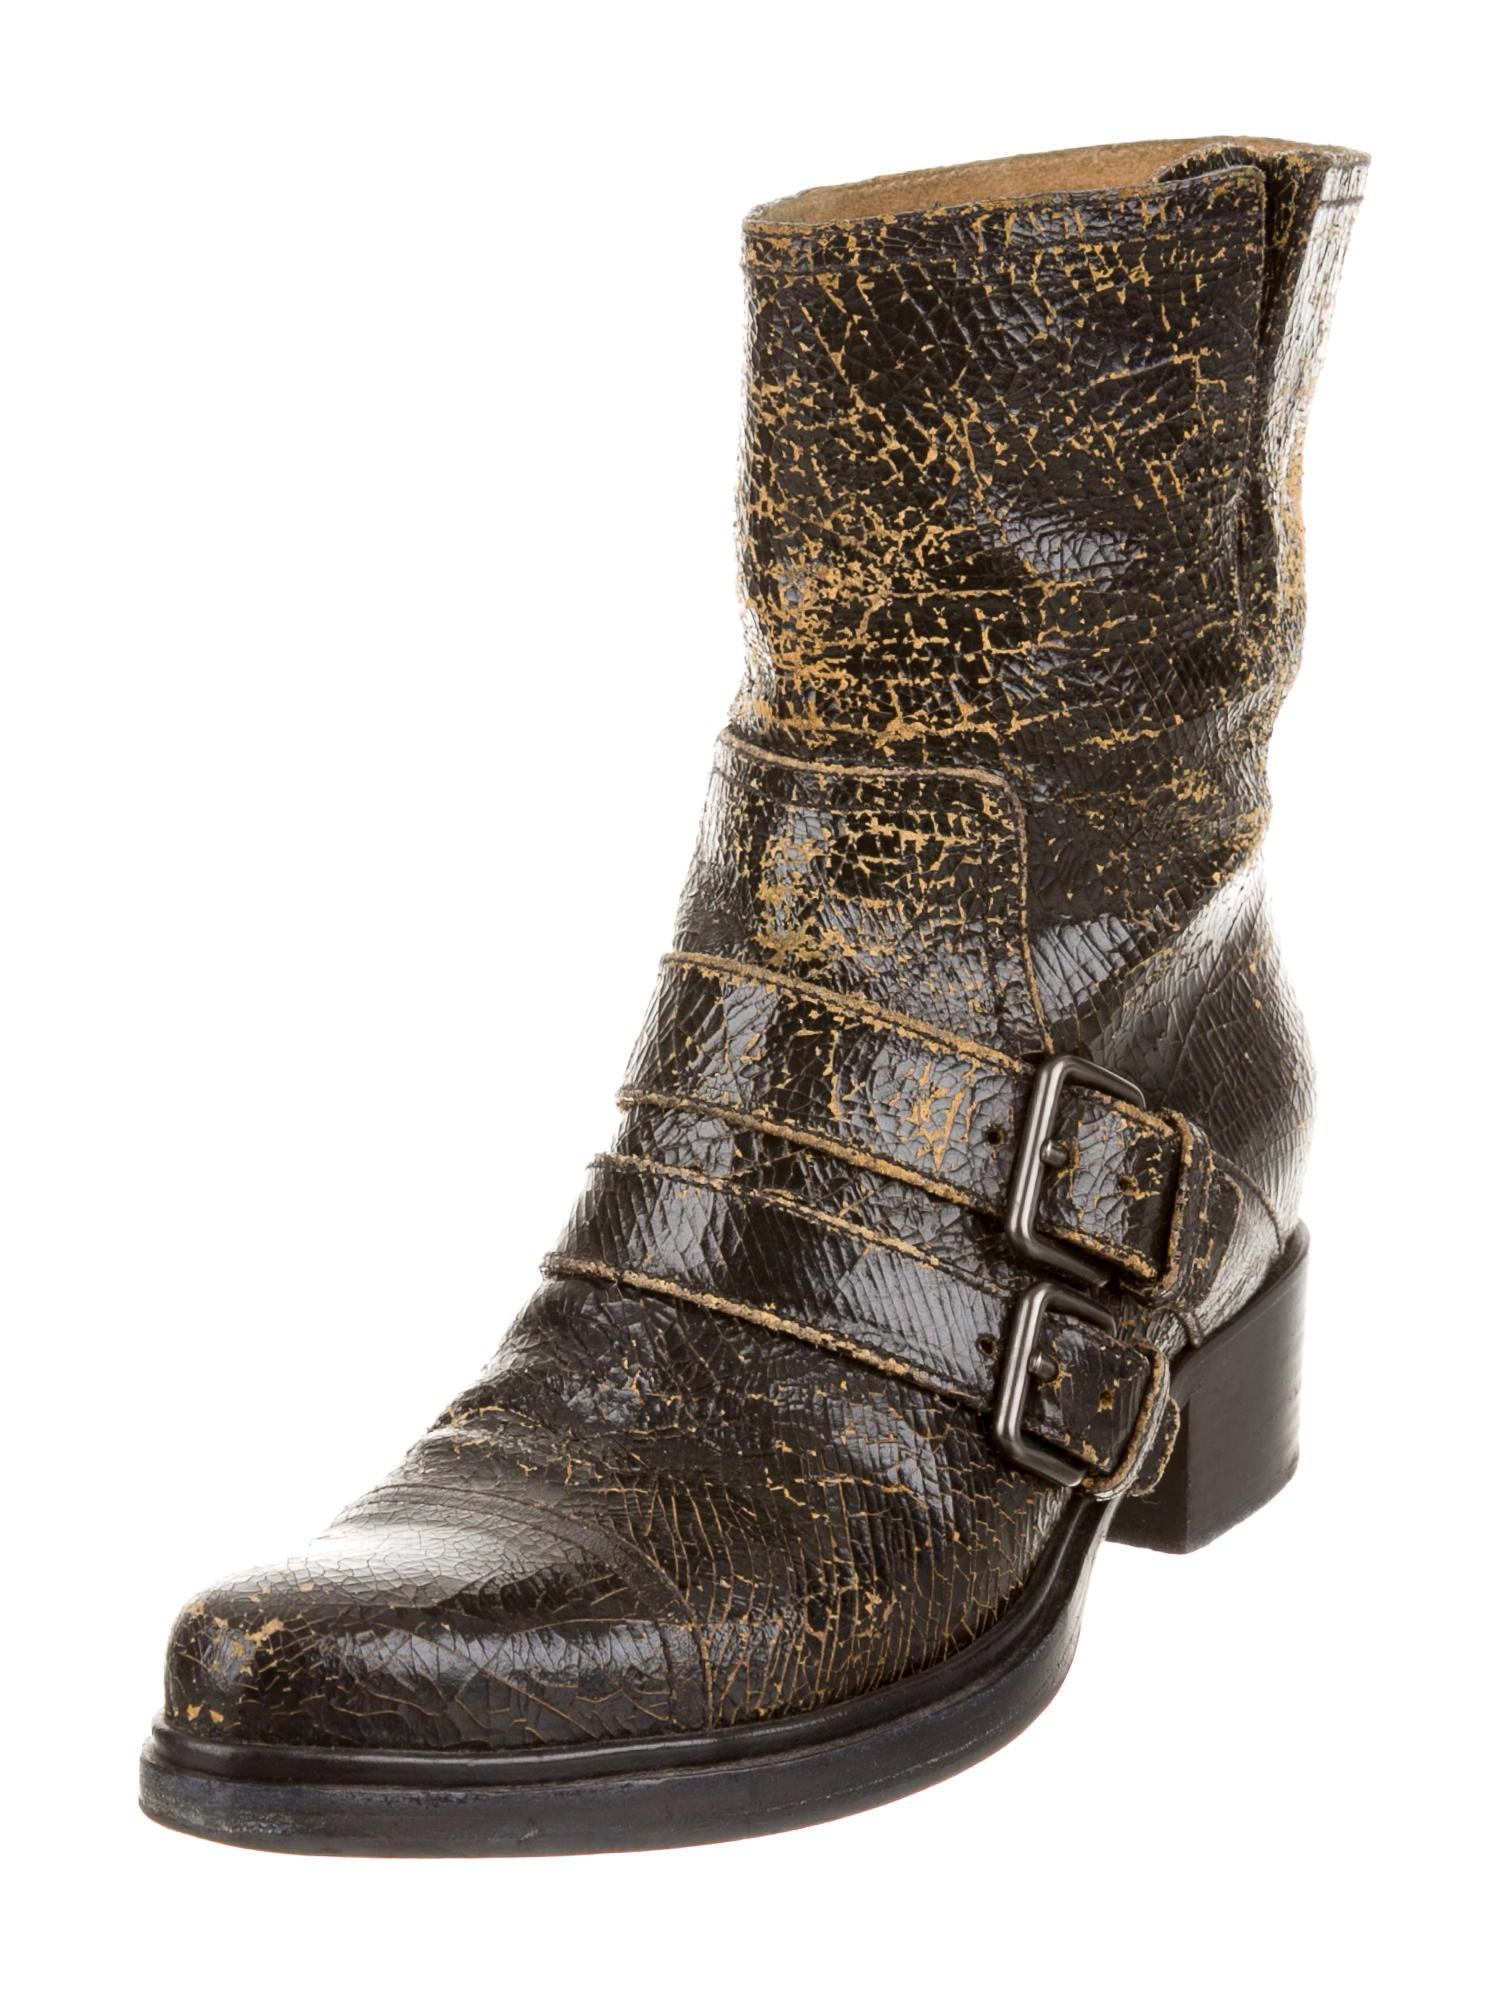 miu miu distressed leather boots shoes miu33206 the